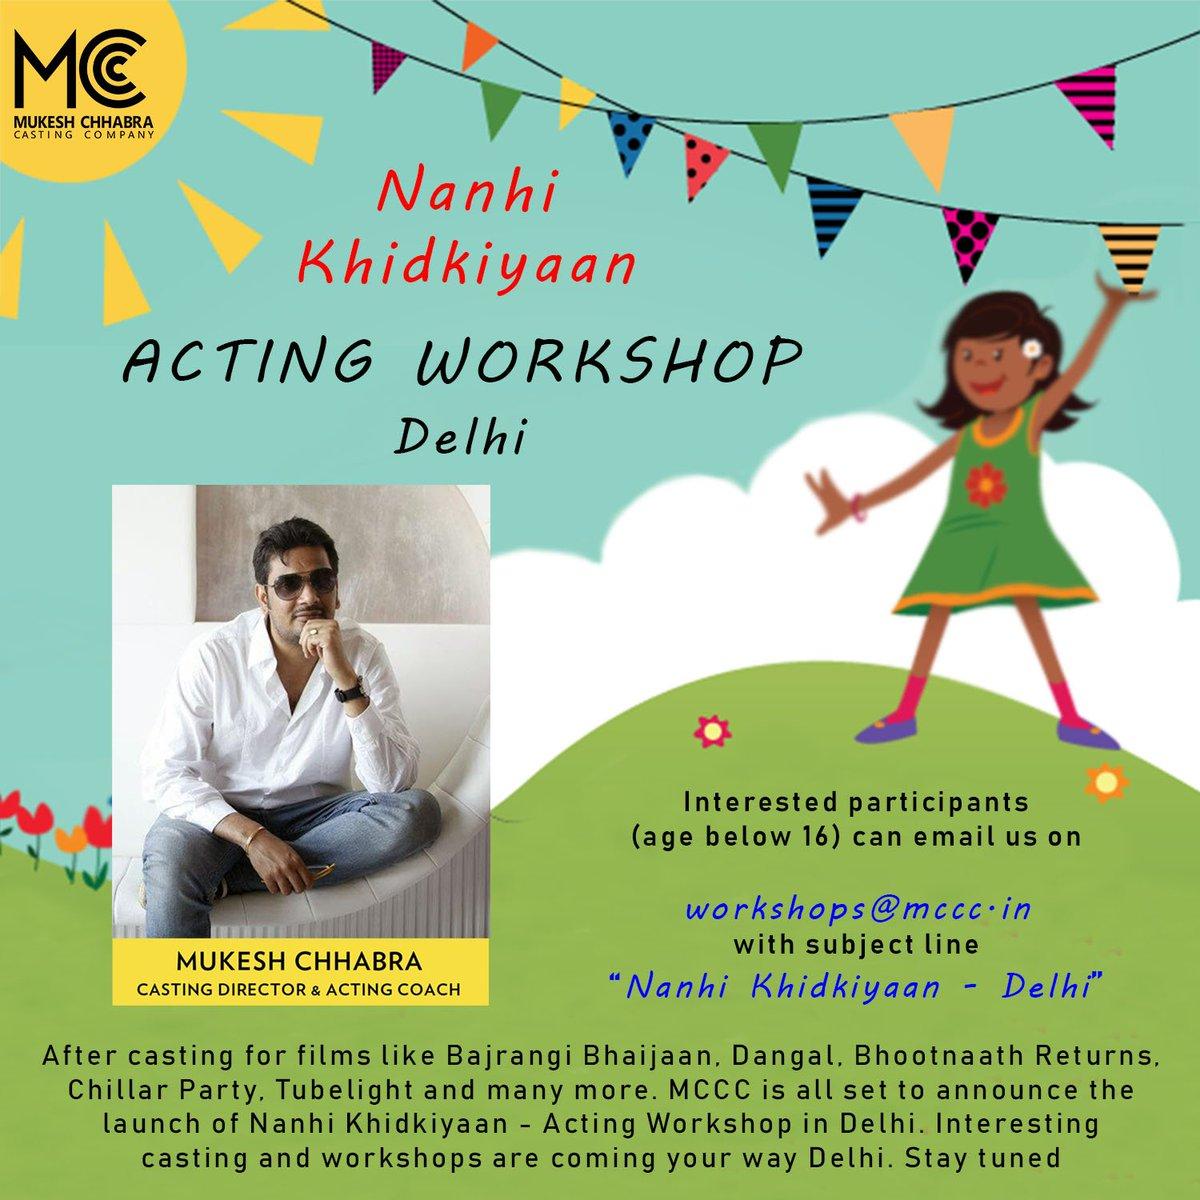 Wowww! Nanhi Khidkiyaan!! Soooo cool!!! 👌🏻👌🏻❤️❤️🤗 great opportunity for kids!!👇👇